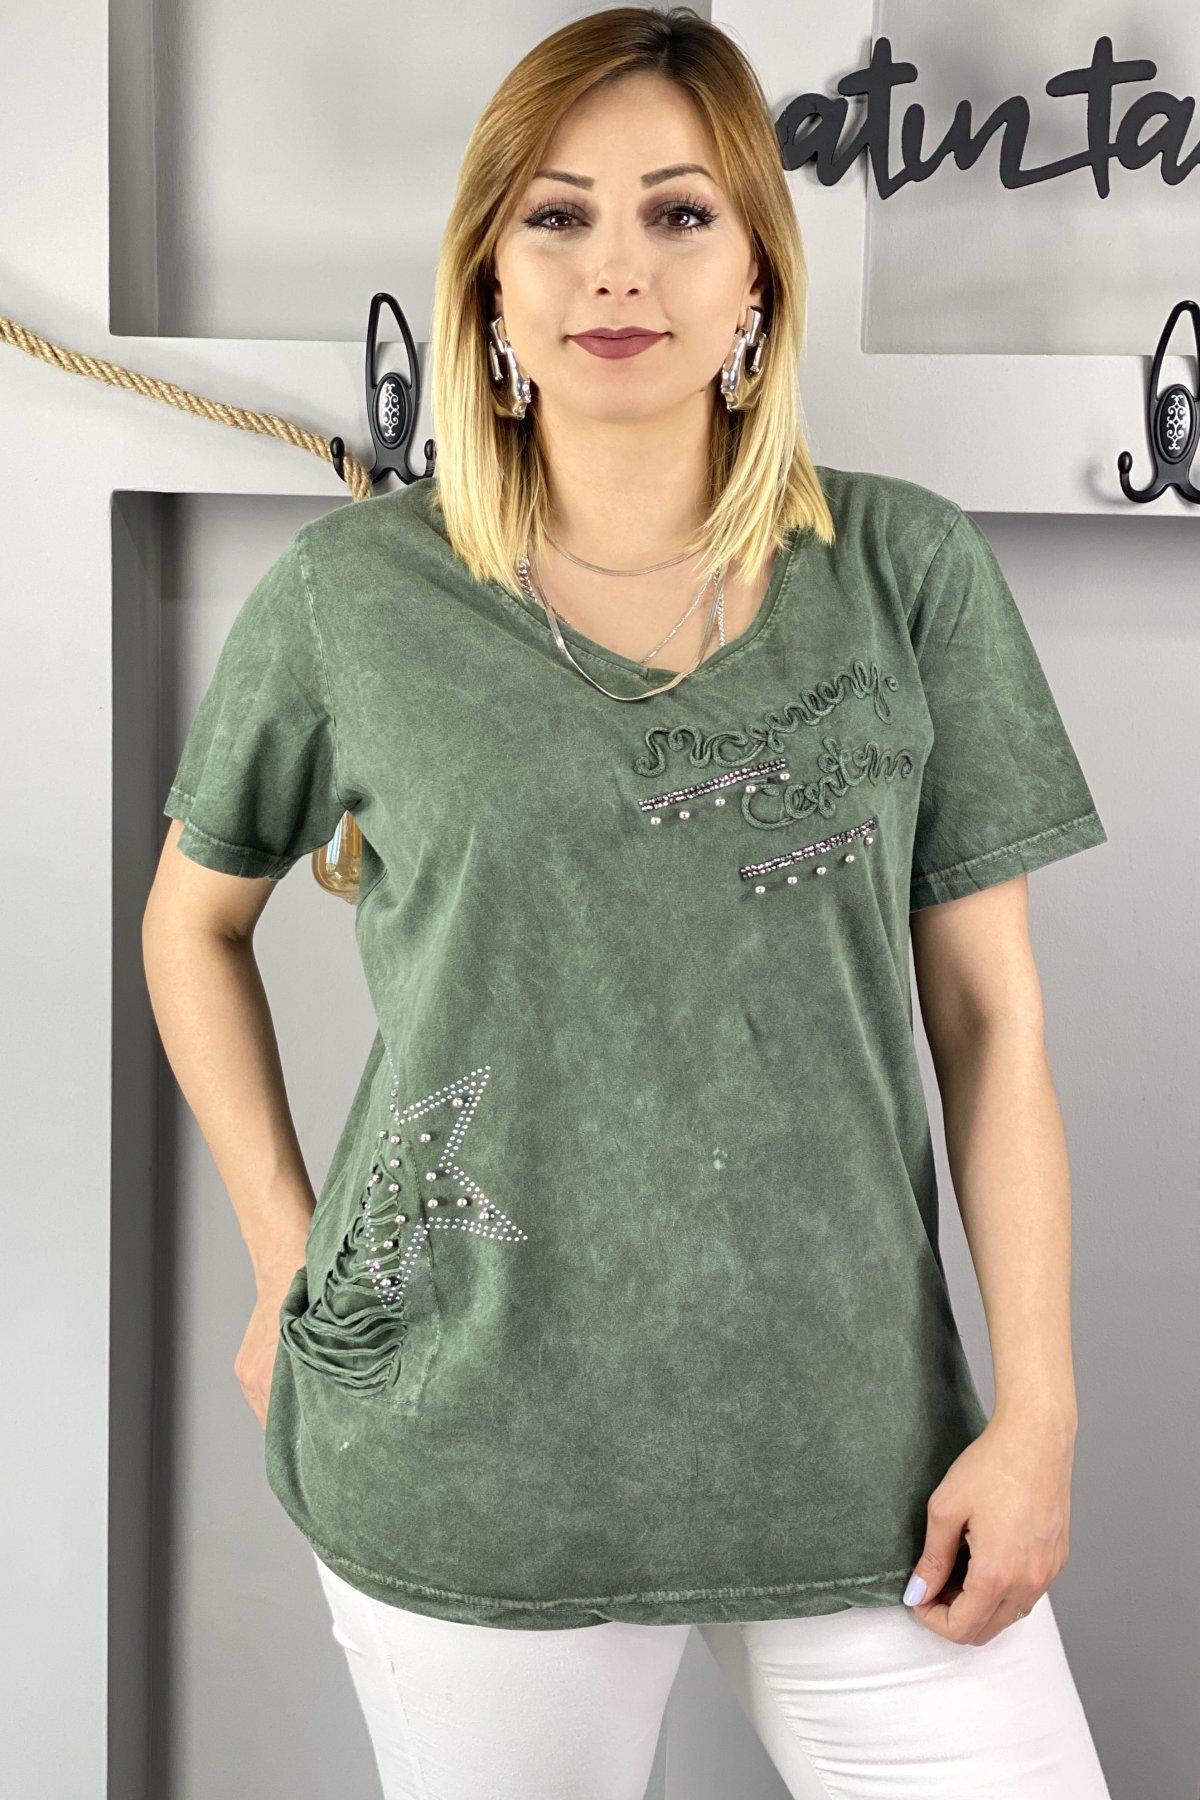 https://resim.chicbag.com.tr/p000669/hy/sol-gogus-ustu-yazili-sag-tarafi-kesik-ustune-yildiz-detayli-v-yaka-kisa-kollu-t-shirt-01254e7e7a0b.jpg